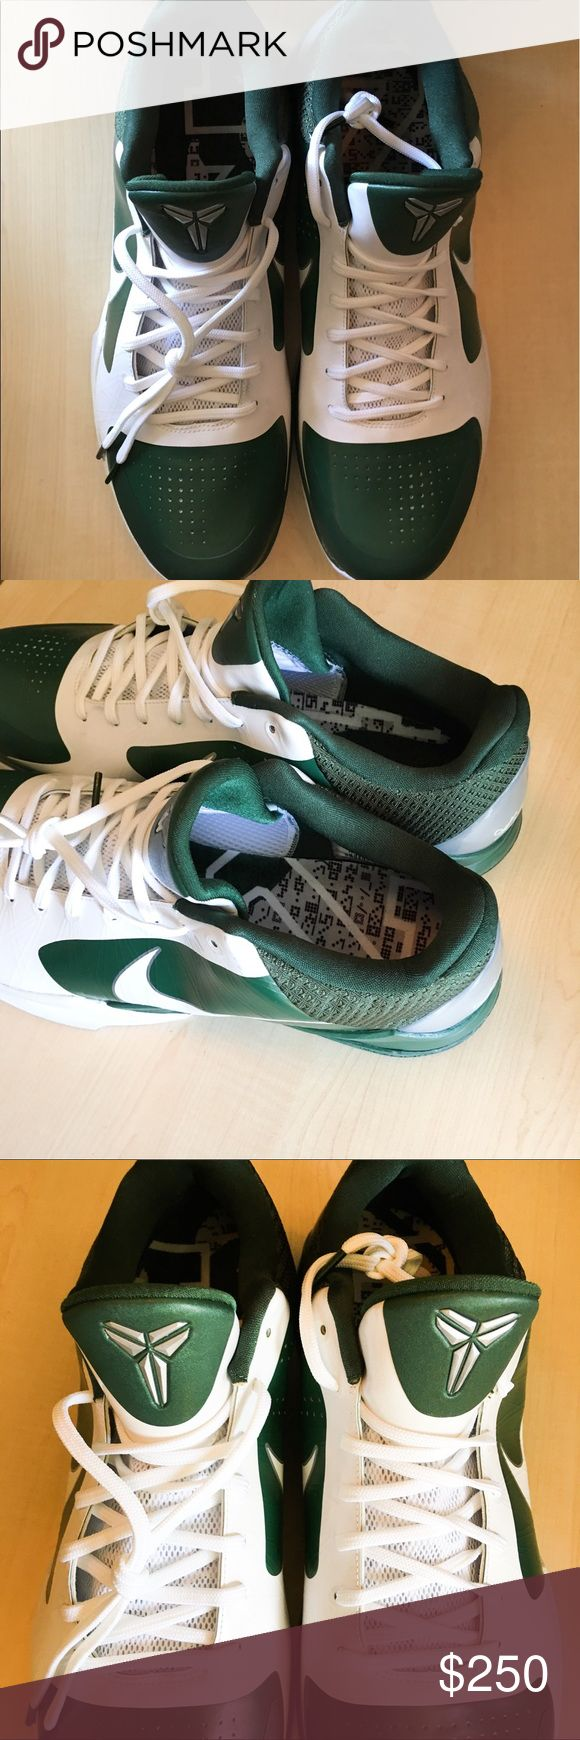 NWOB Nike Zoom Kobe Basketball Shoes 16.5 New w/out Box Nike Zoom Kobe Basketball Shoes 16.5 Nike Shoes Sneakers